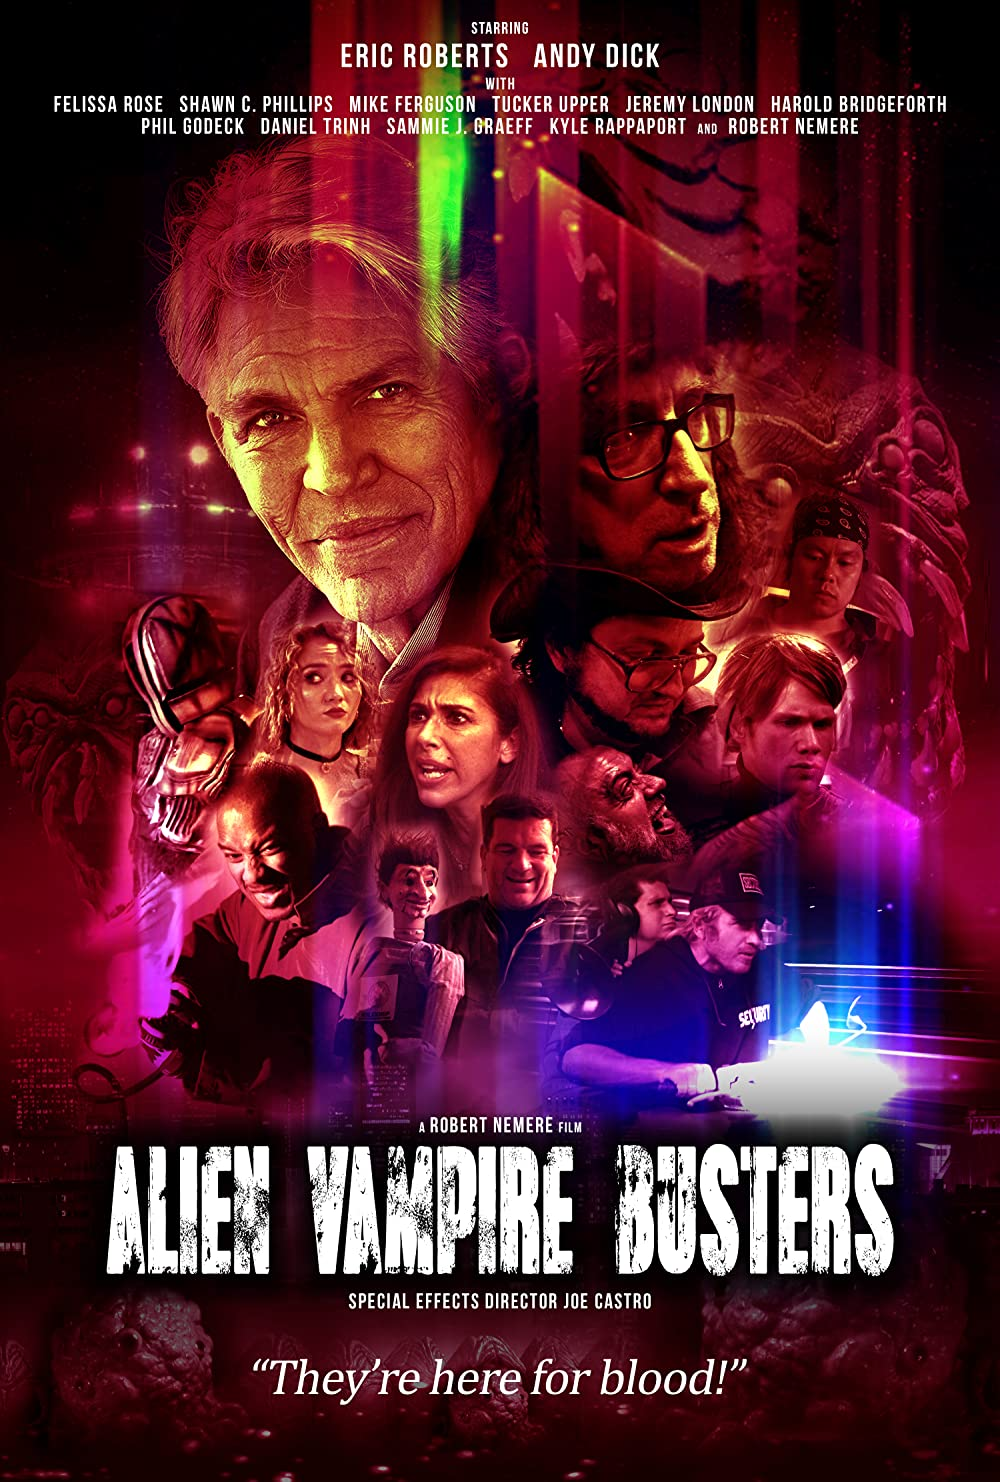 Alien Vampire Busters poster